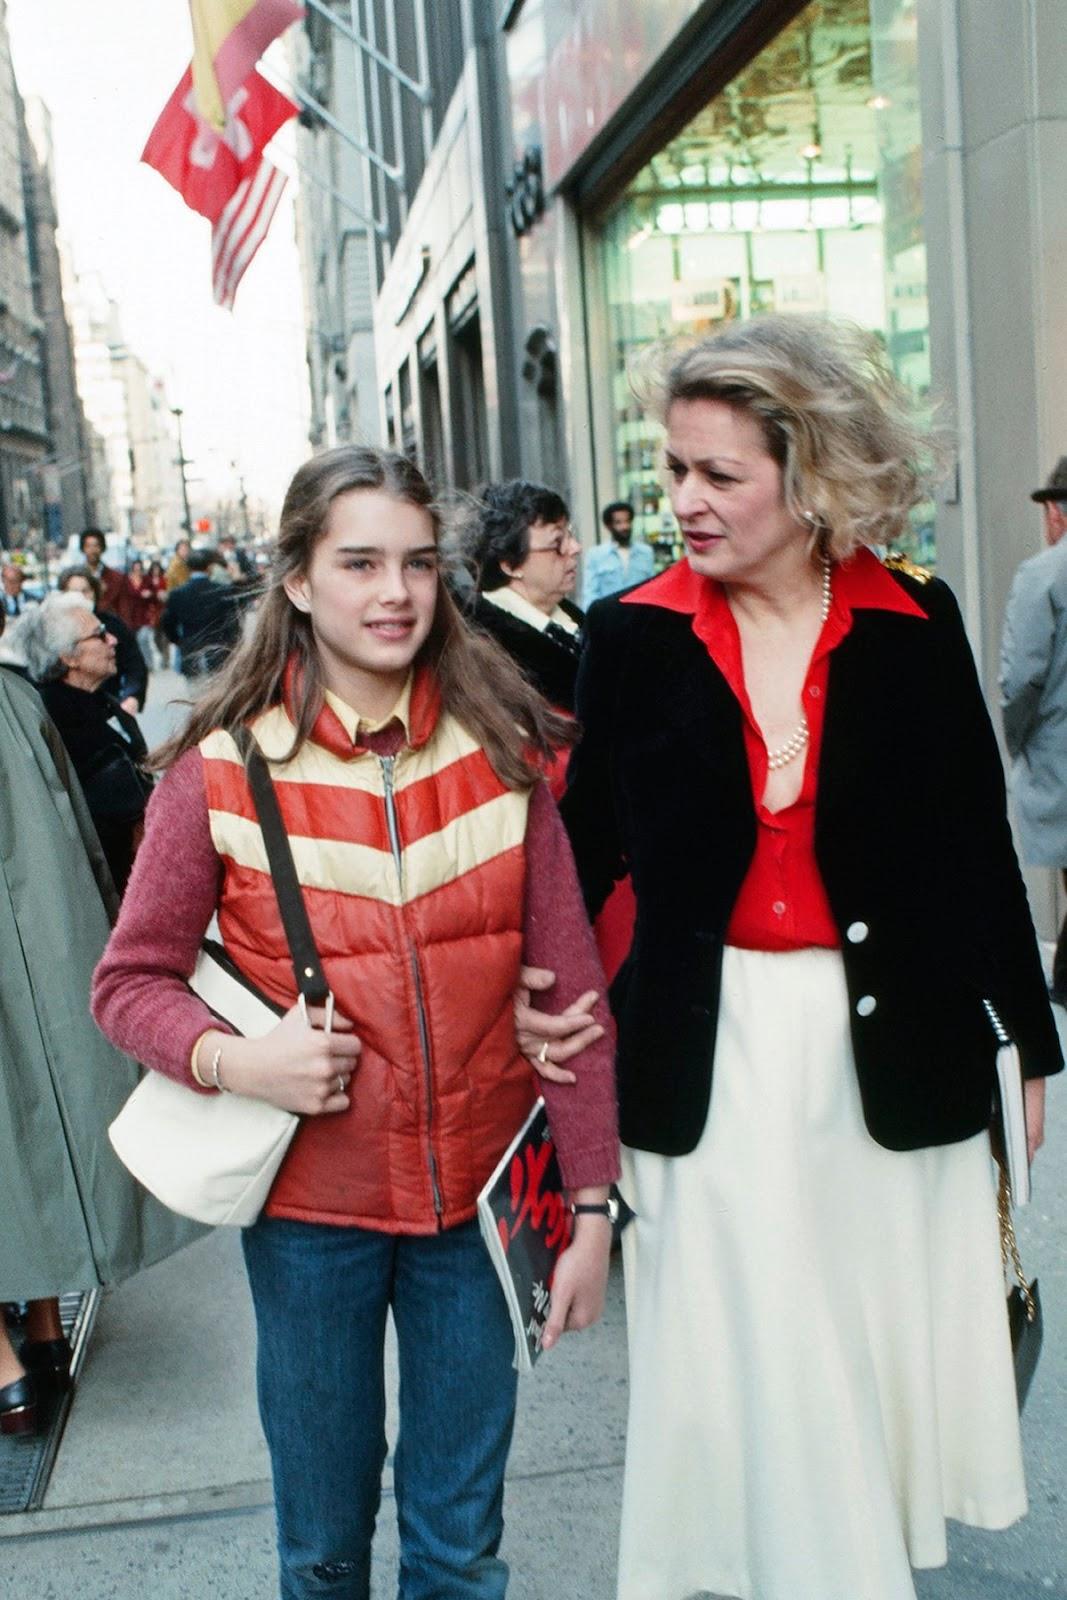 Rare and Beautiful Photos of Teenaged American Actress and